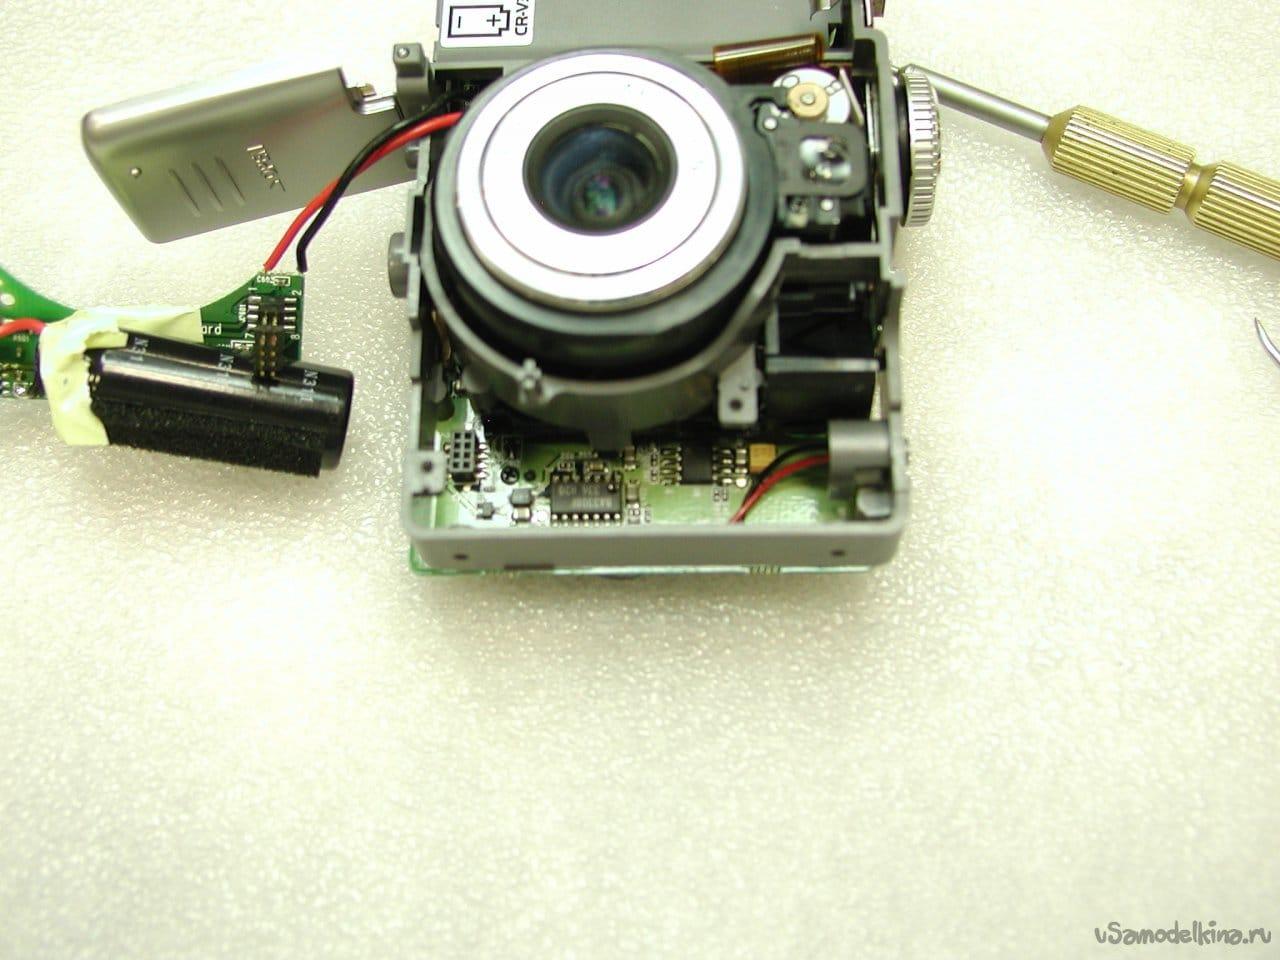 As the camera dug sand. Genius P-433